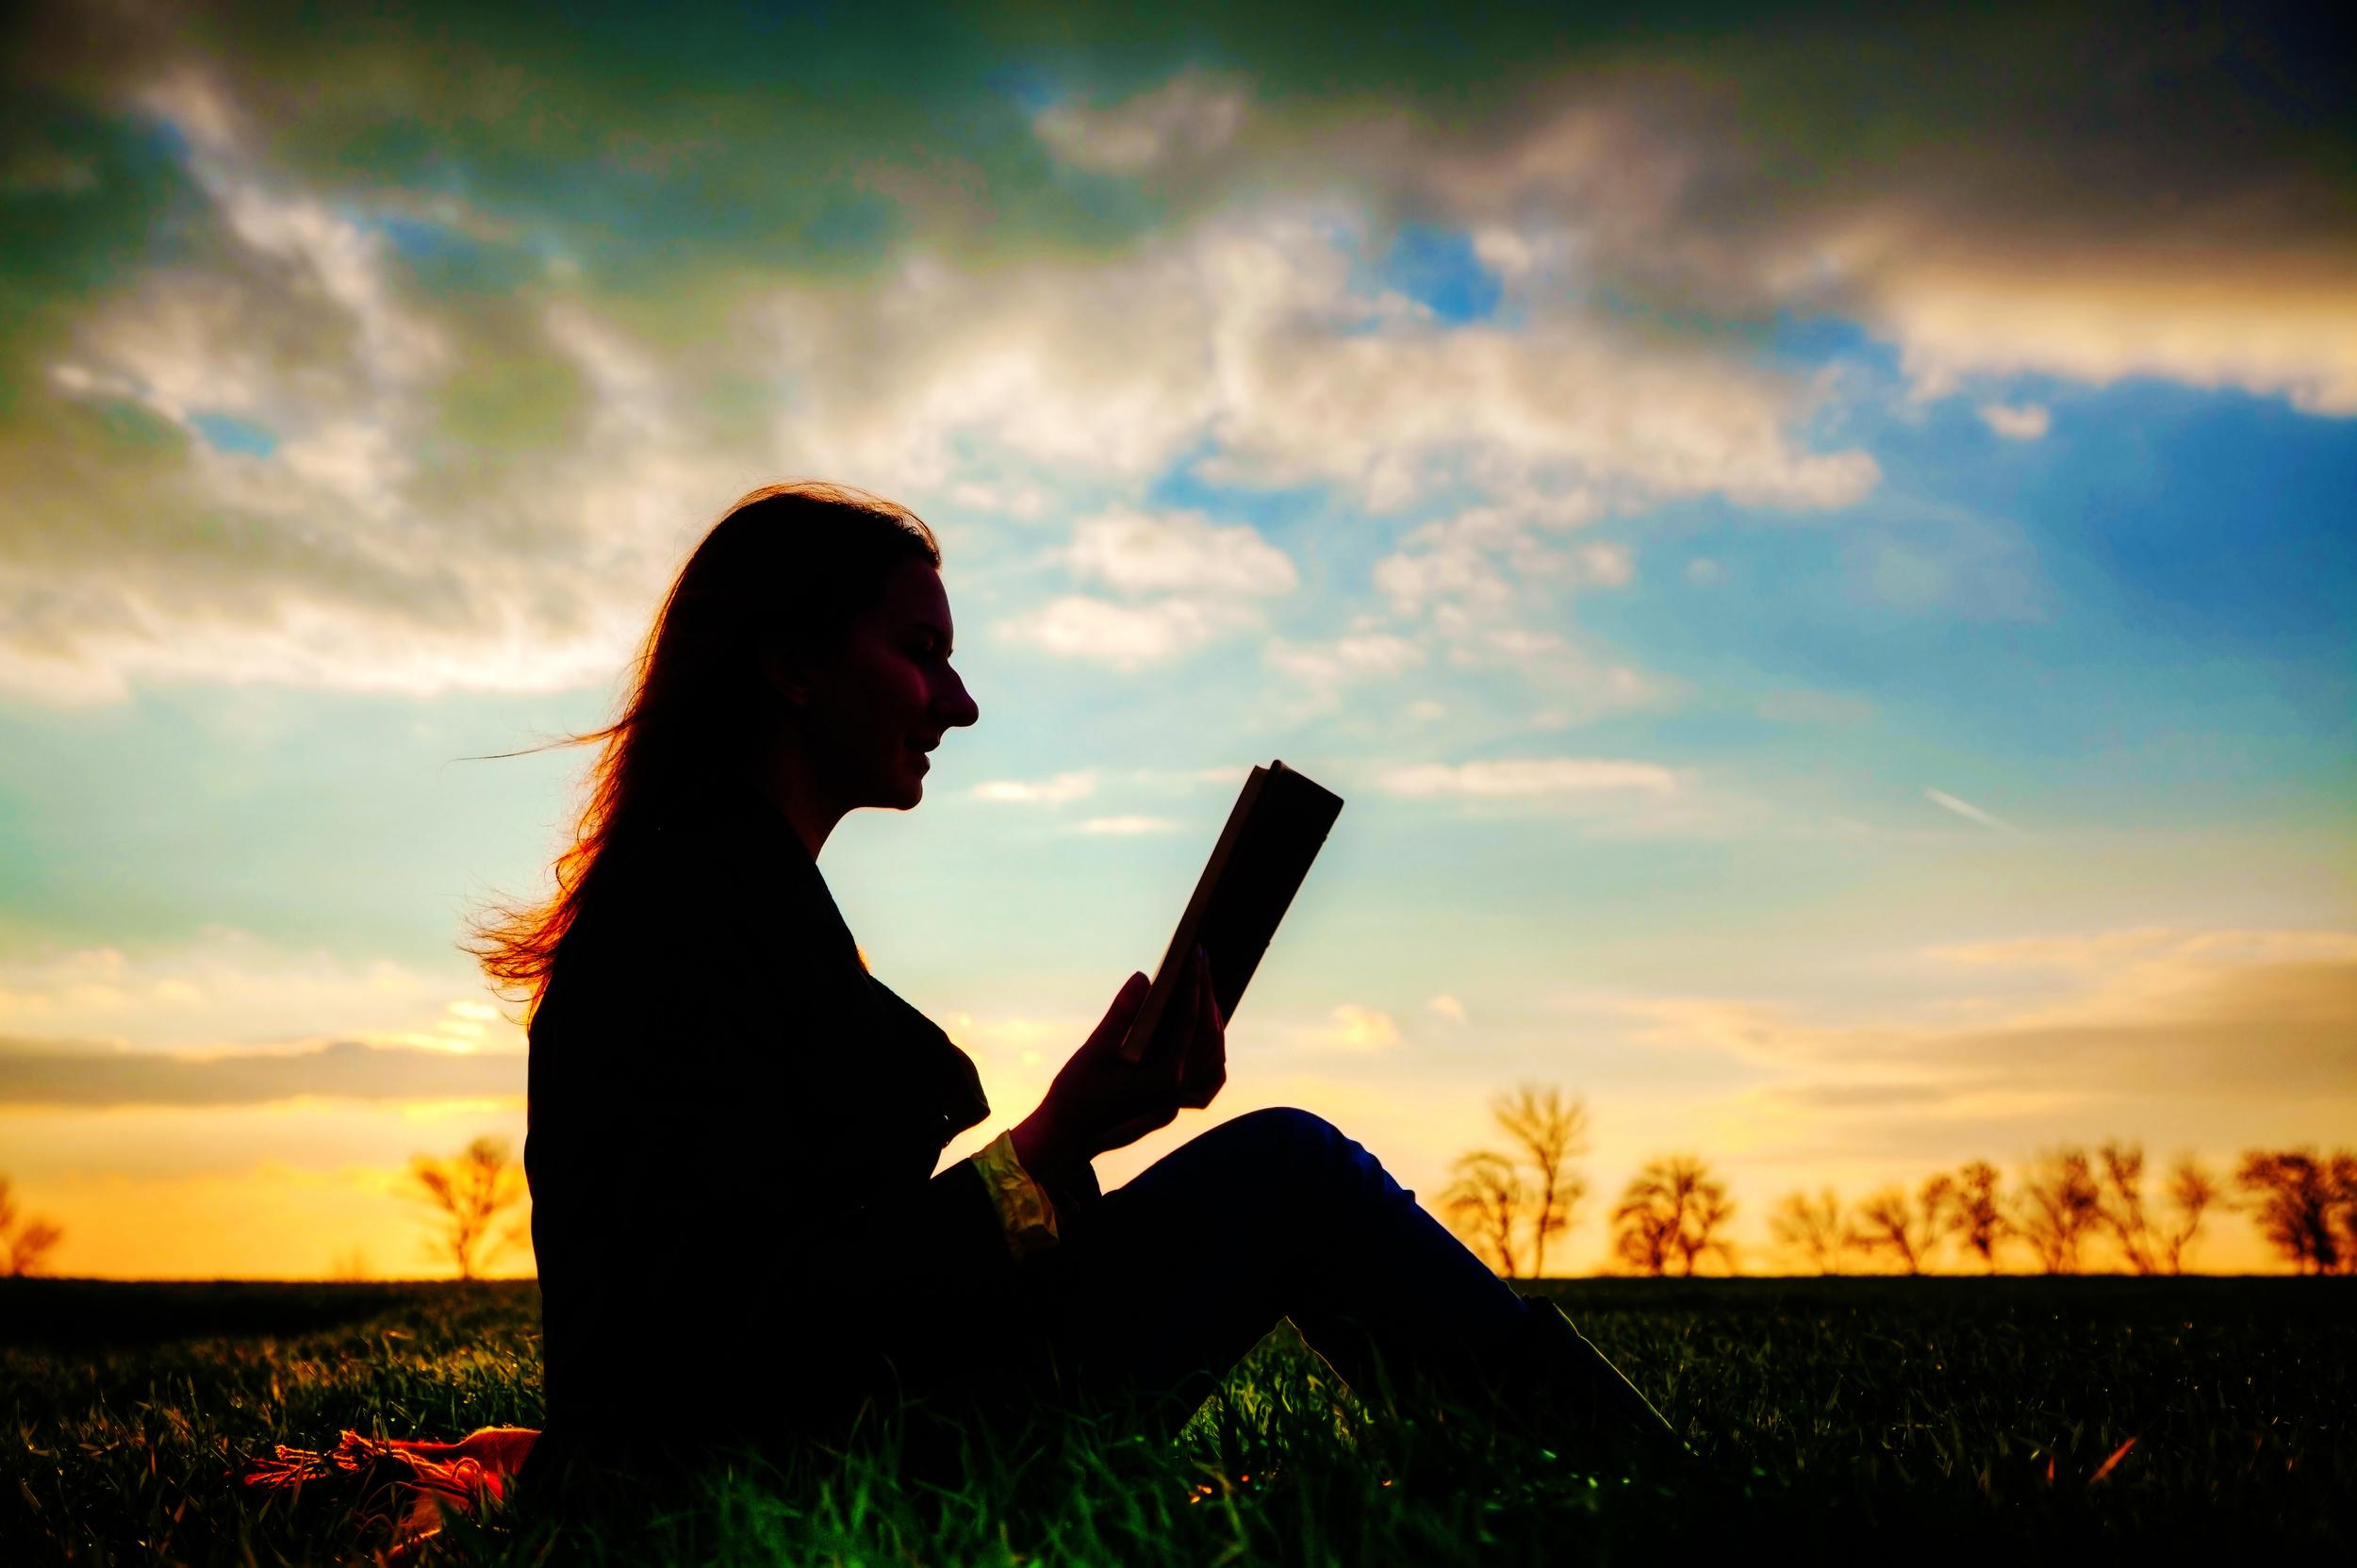 Girl_story_reading_book